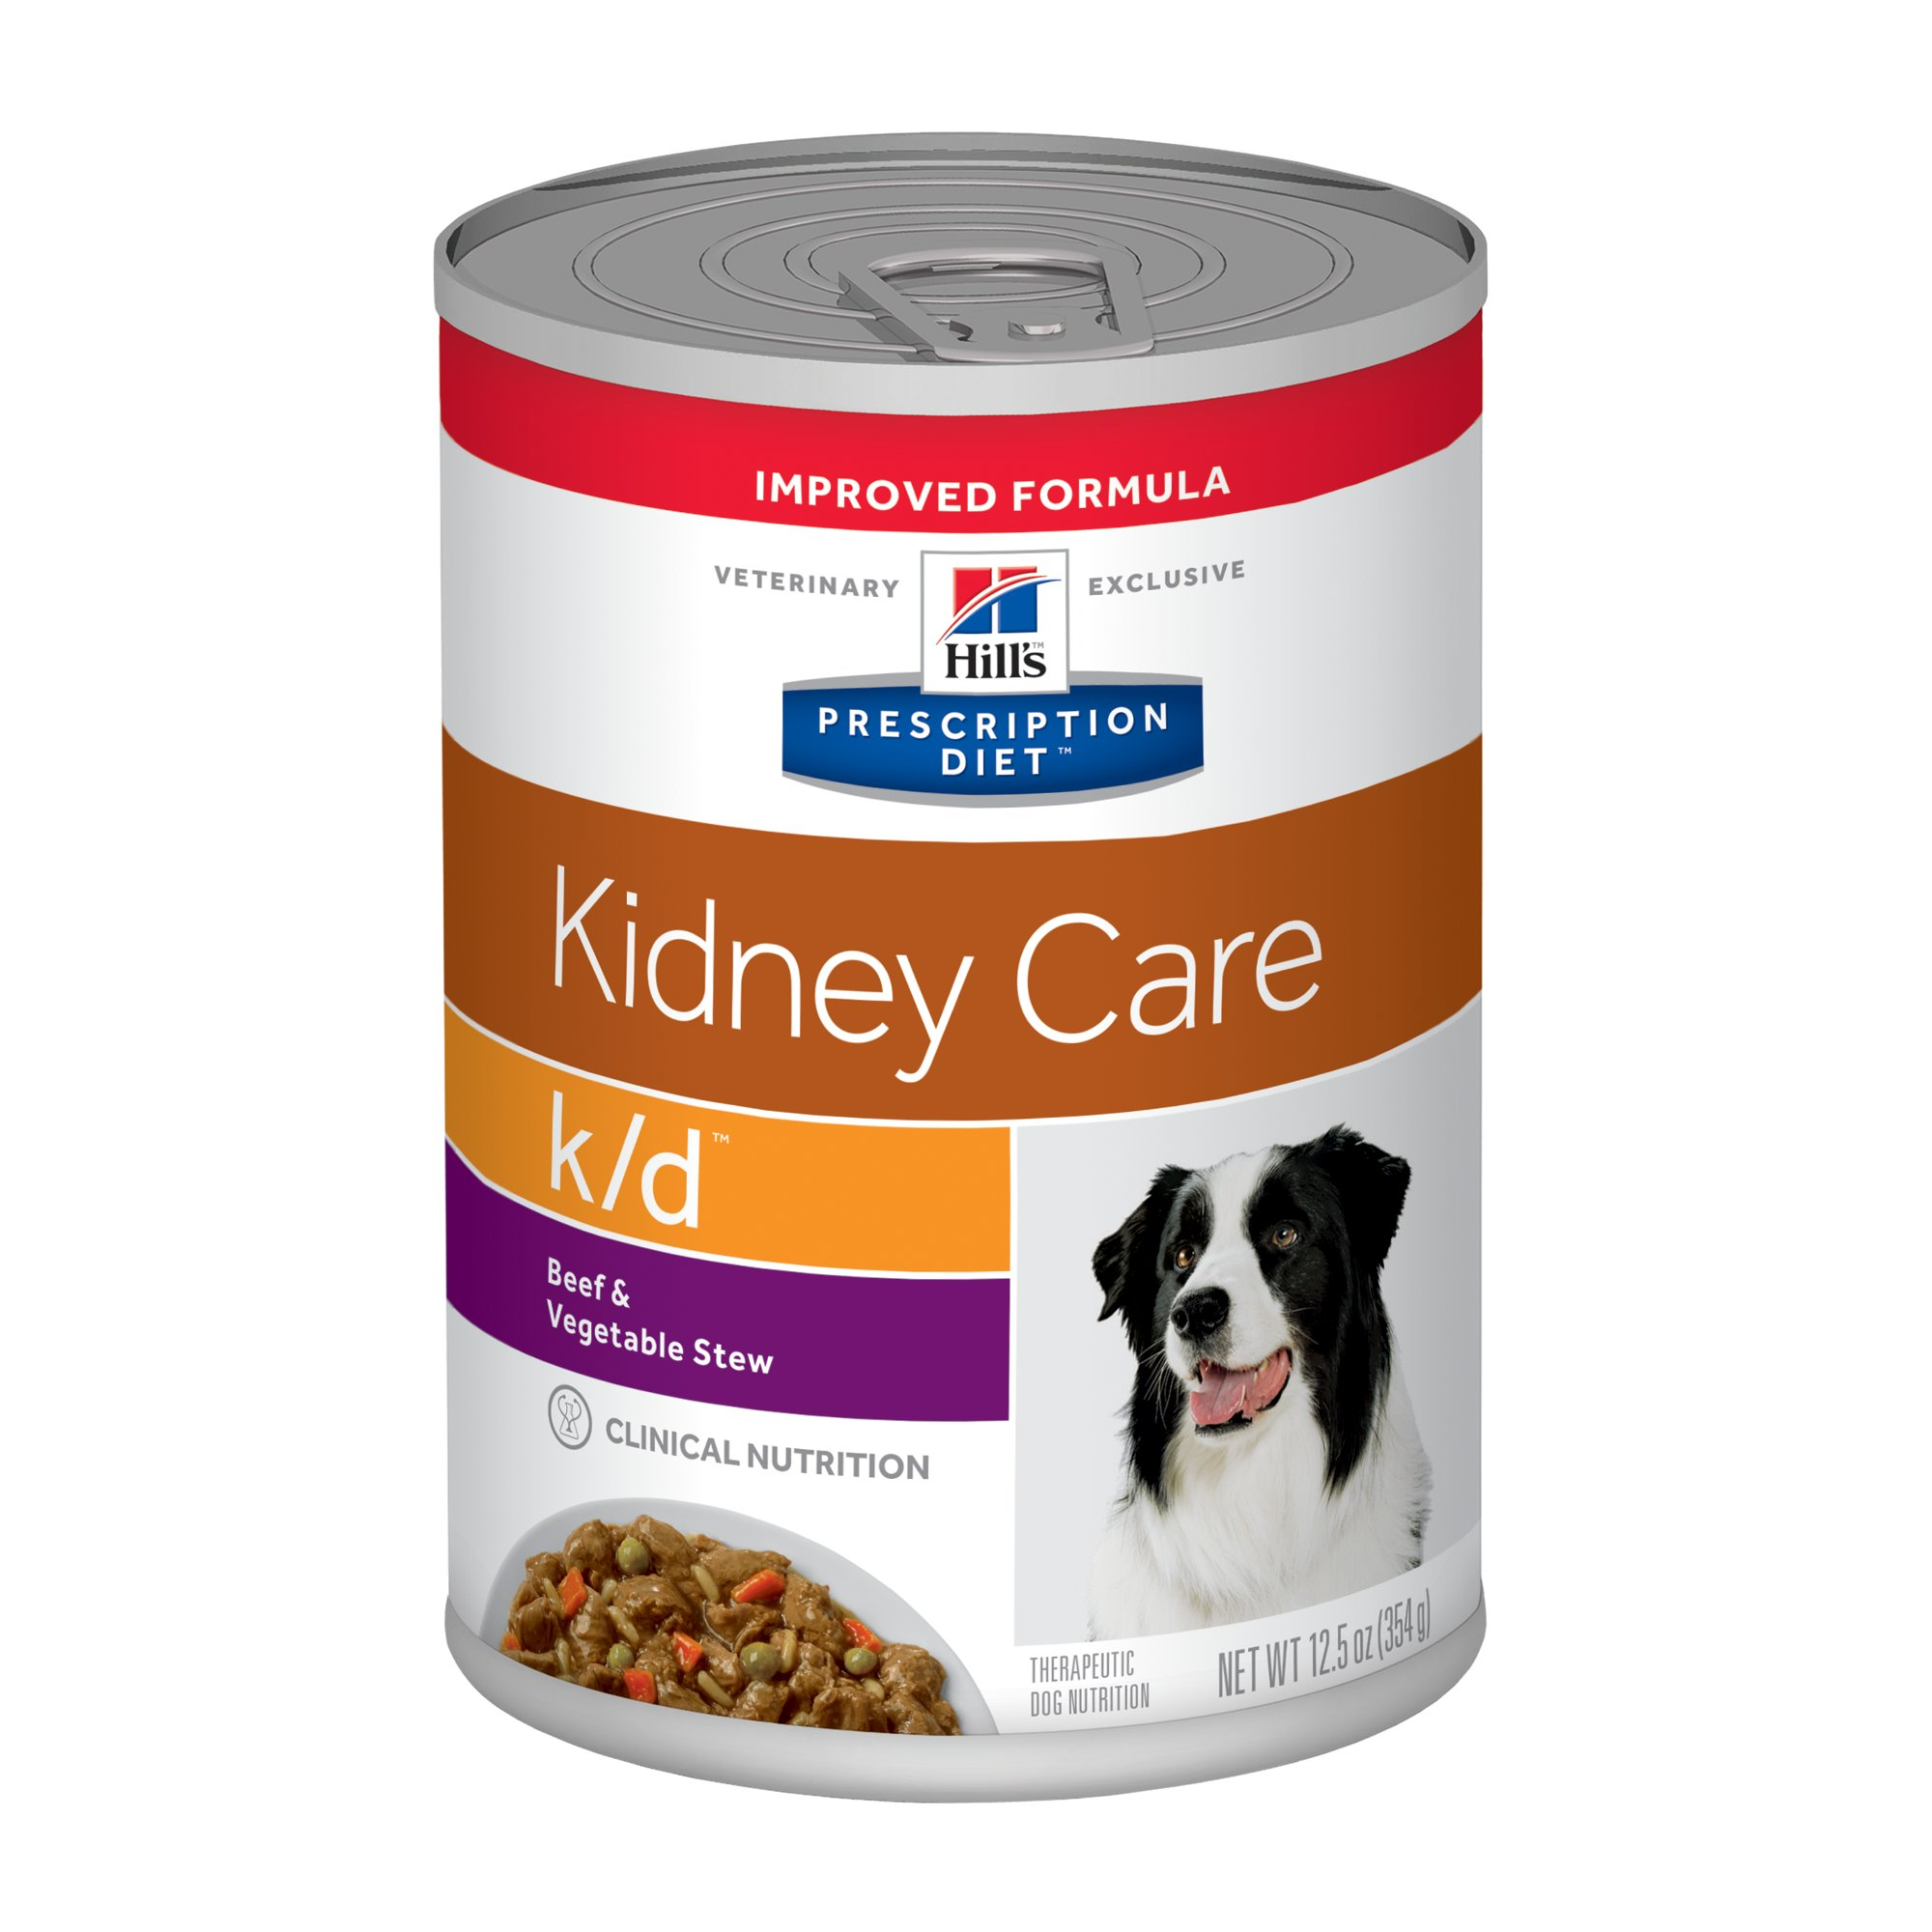 Hills Prescription Diet Kidney Care Cat Food Can